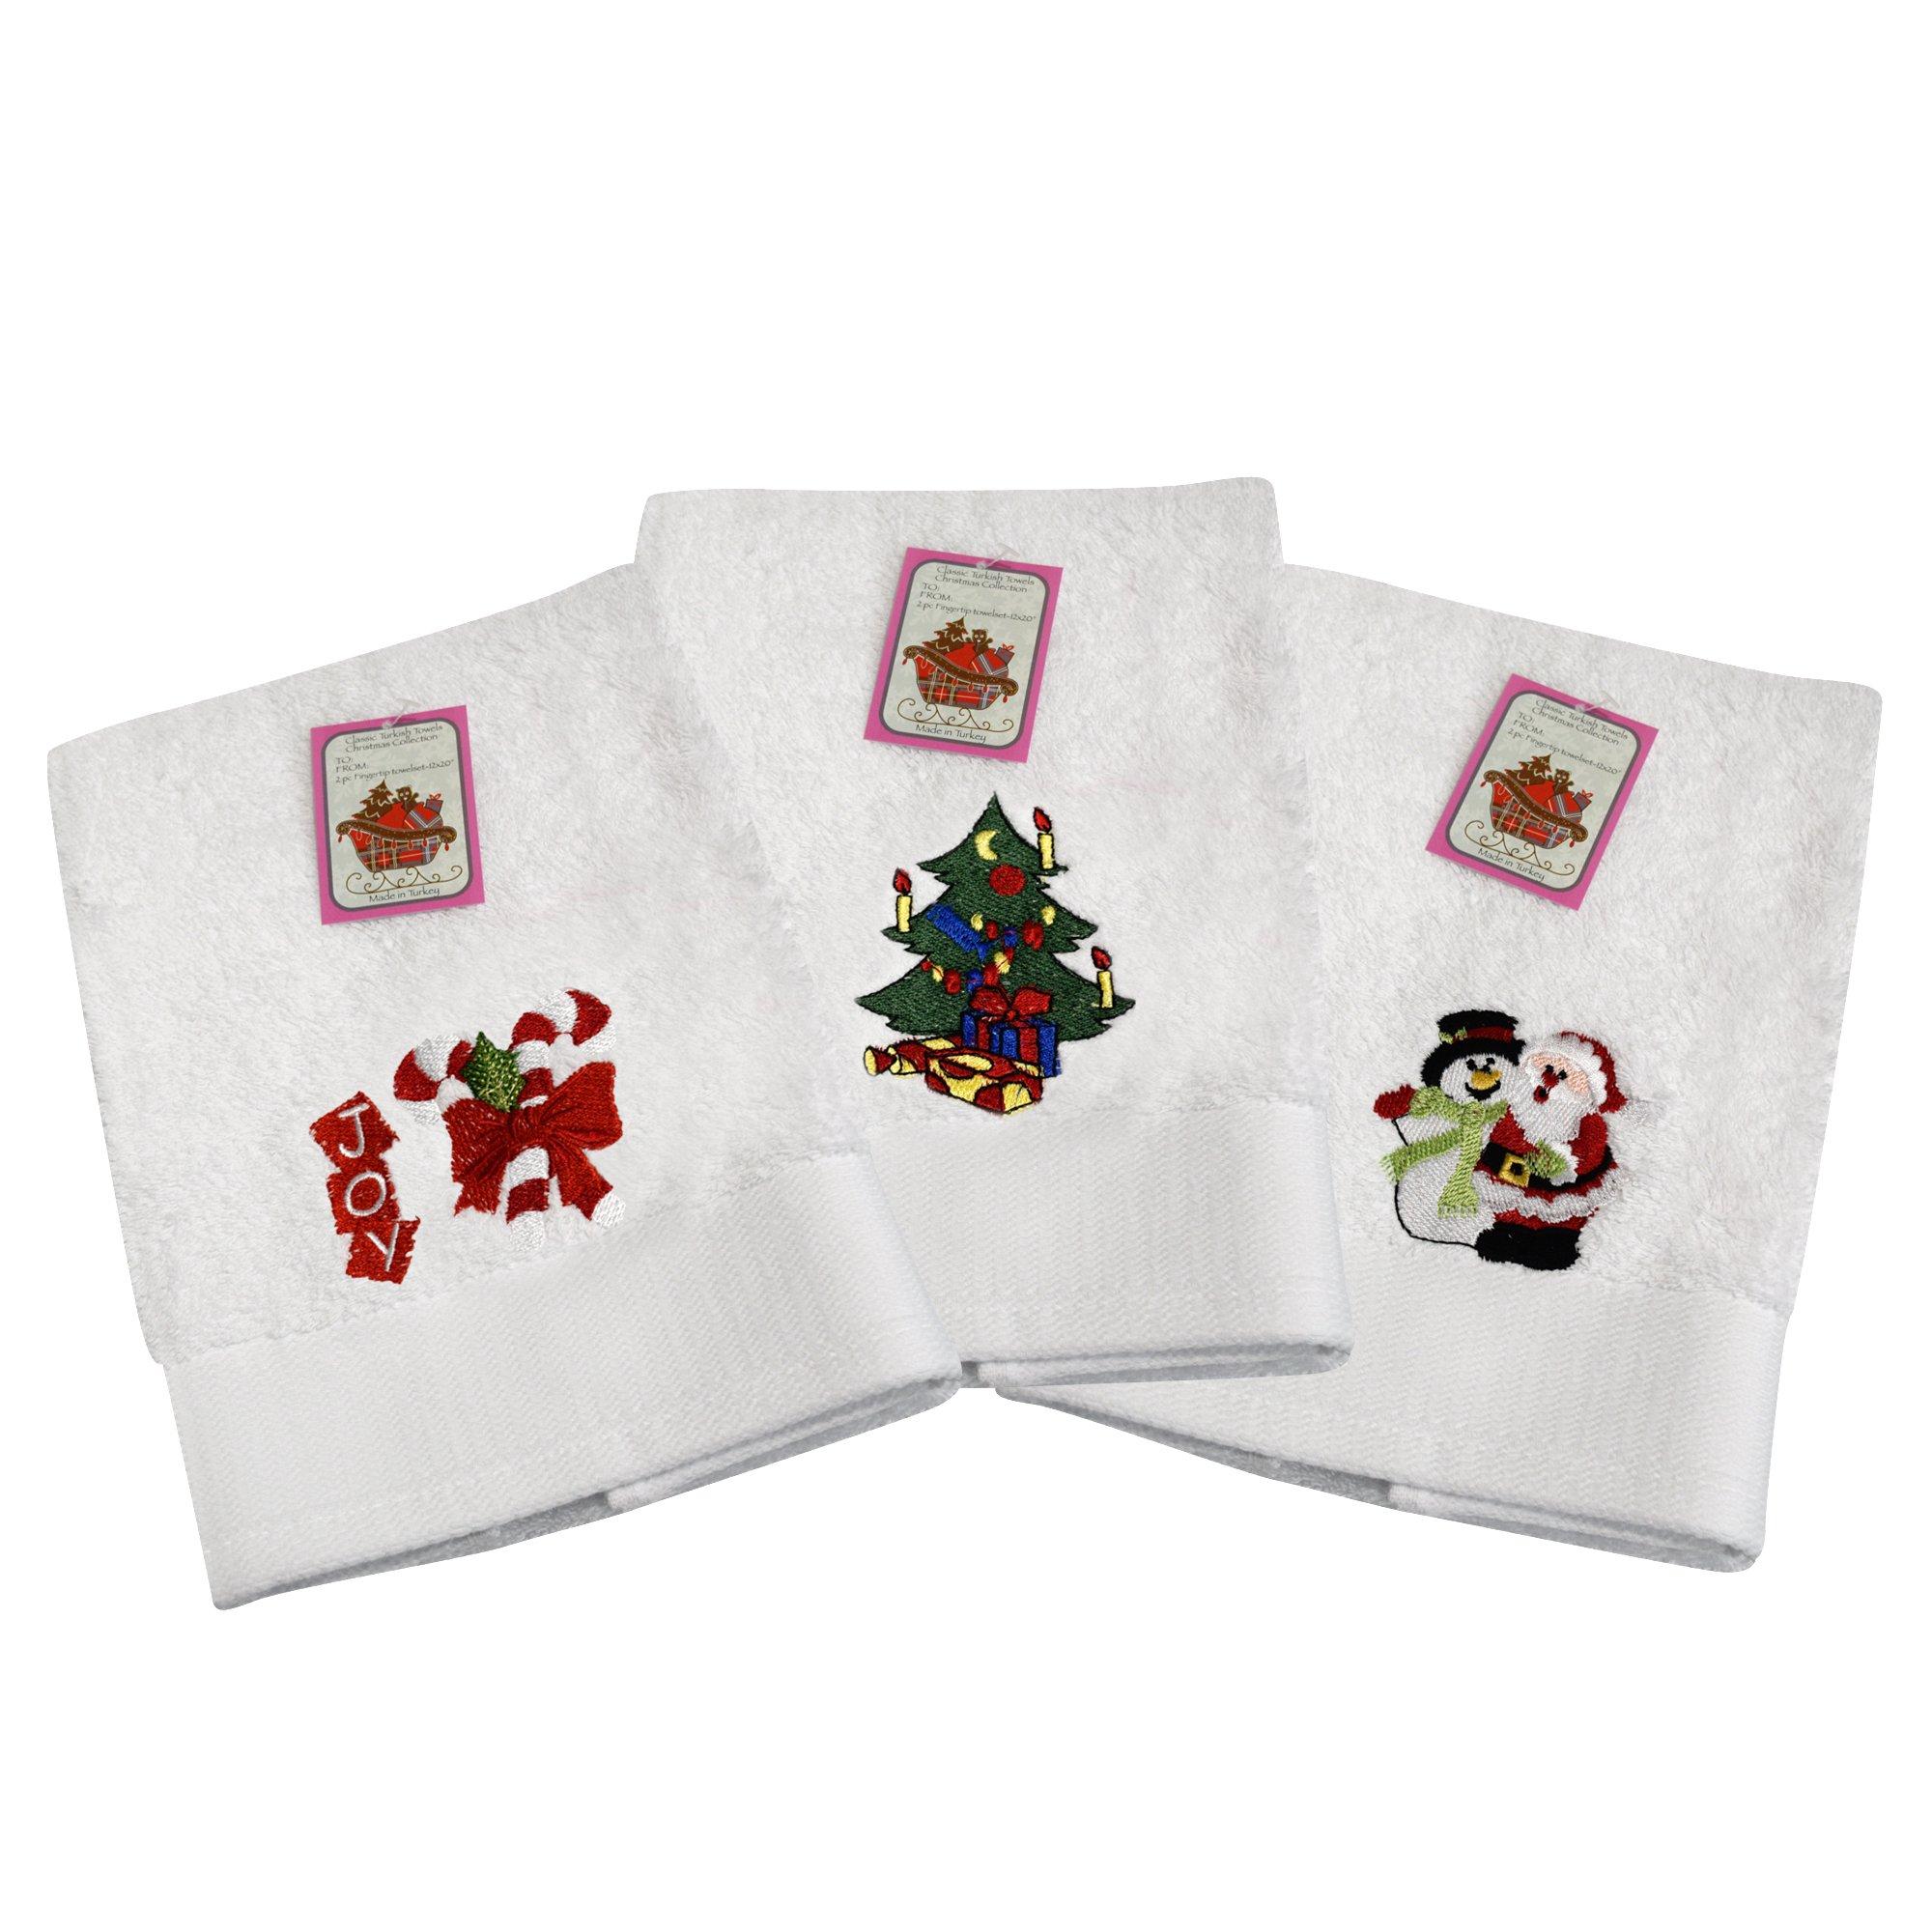 Buy Decorative Luxury Hand Towel Set - 3 piece Christmas Gift Set ...